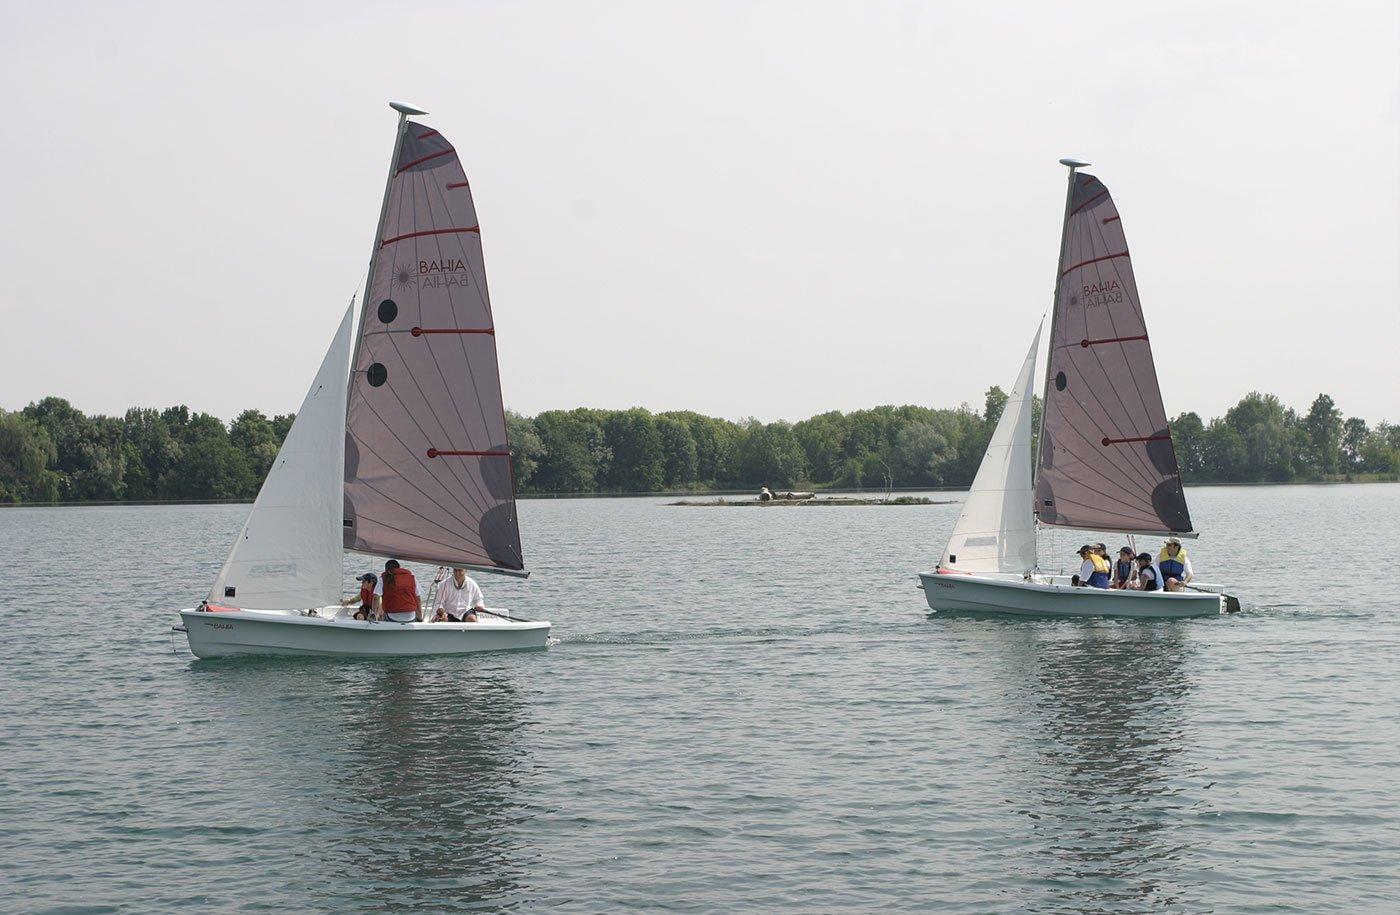 una barca a vela durante una virata